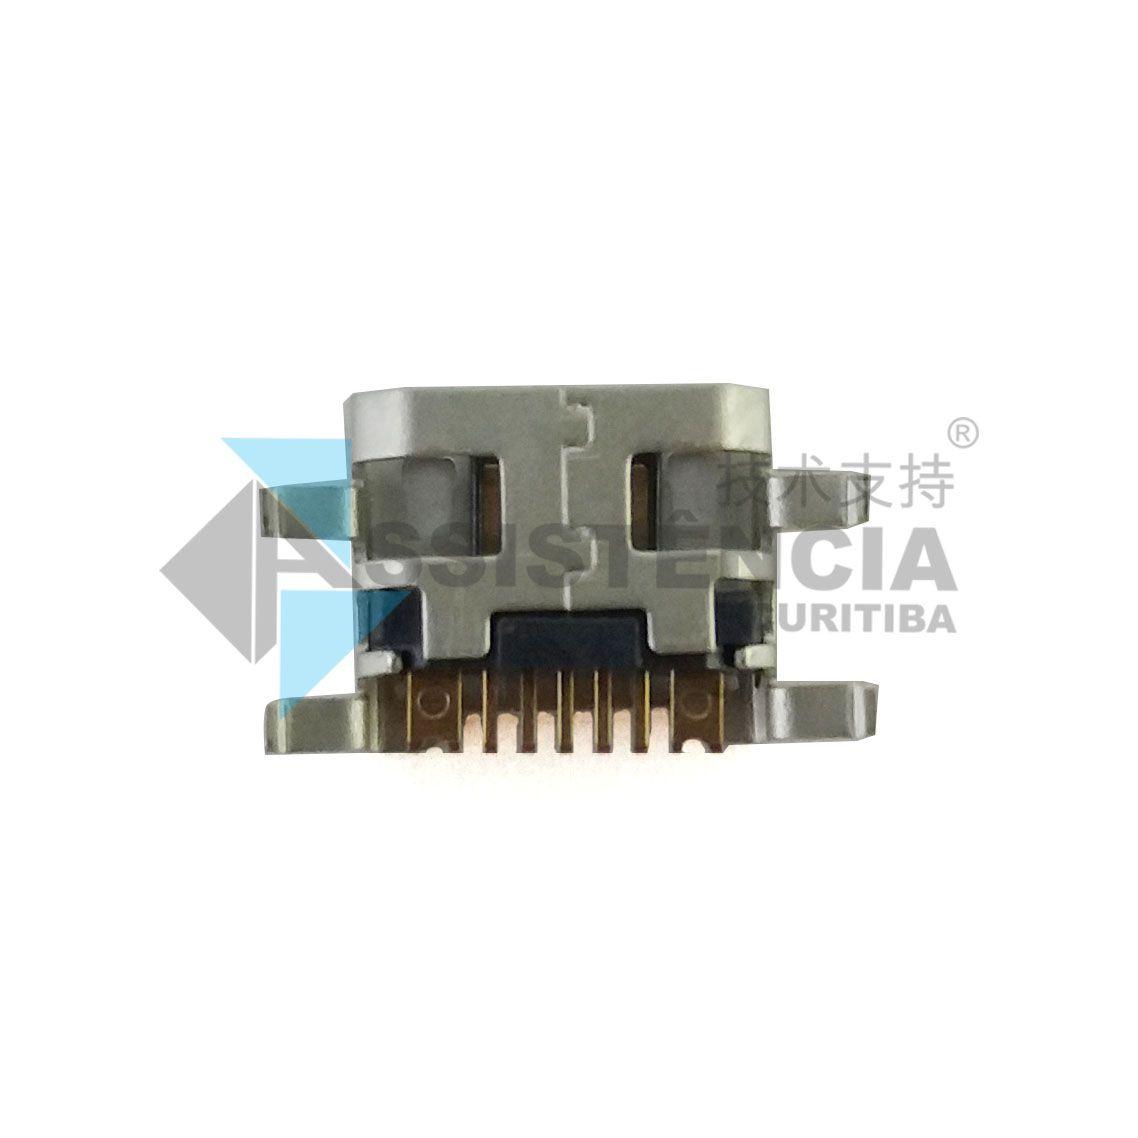 CONECTOR DE CARGA CELULAR LG K10 K430 K430TV ORIGINAL